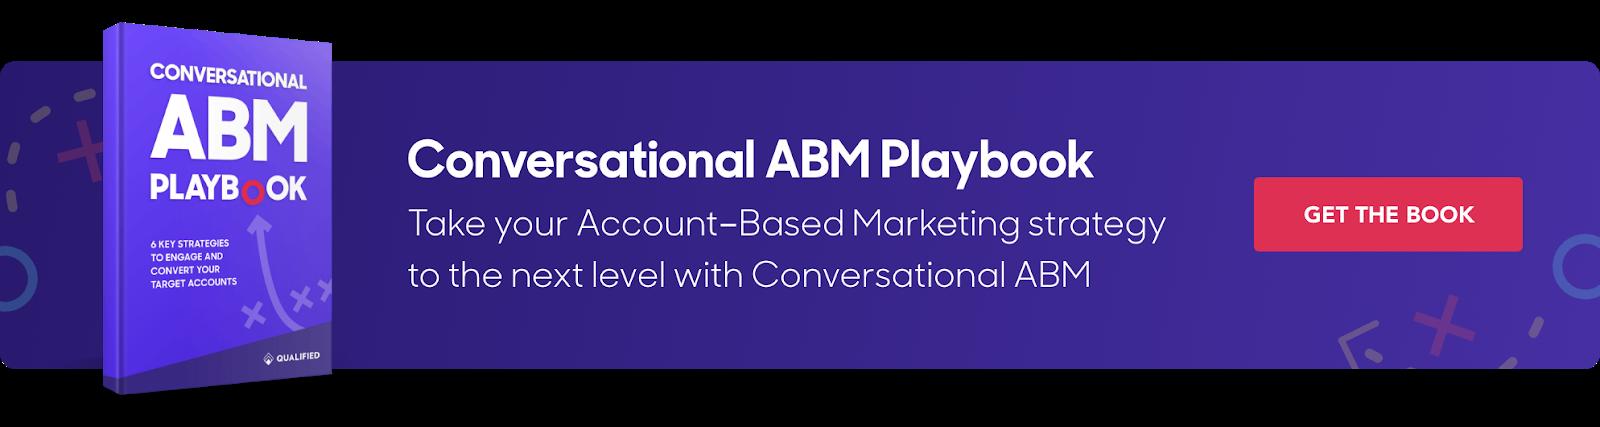 Conversational ABM Playbook